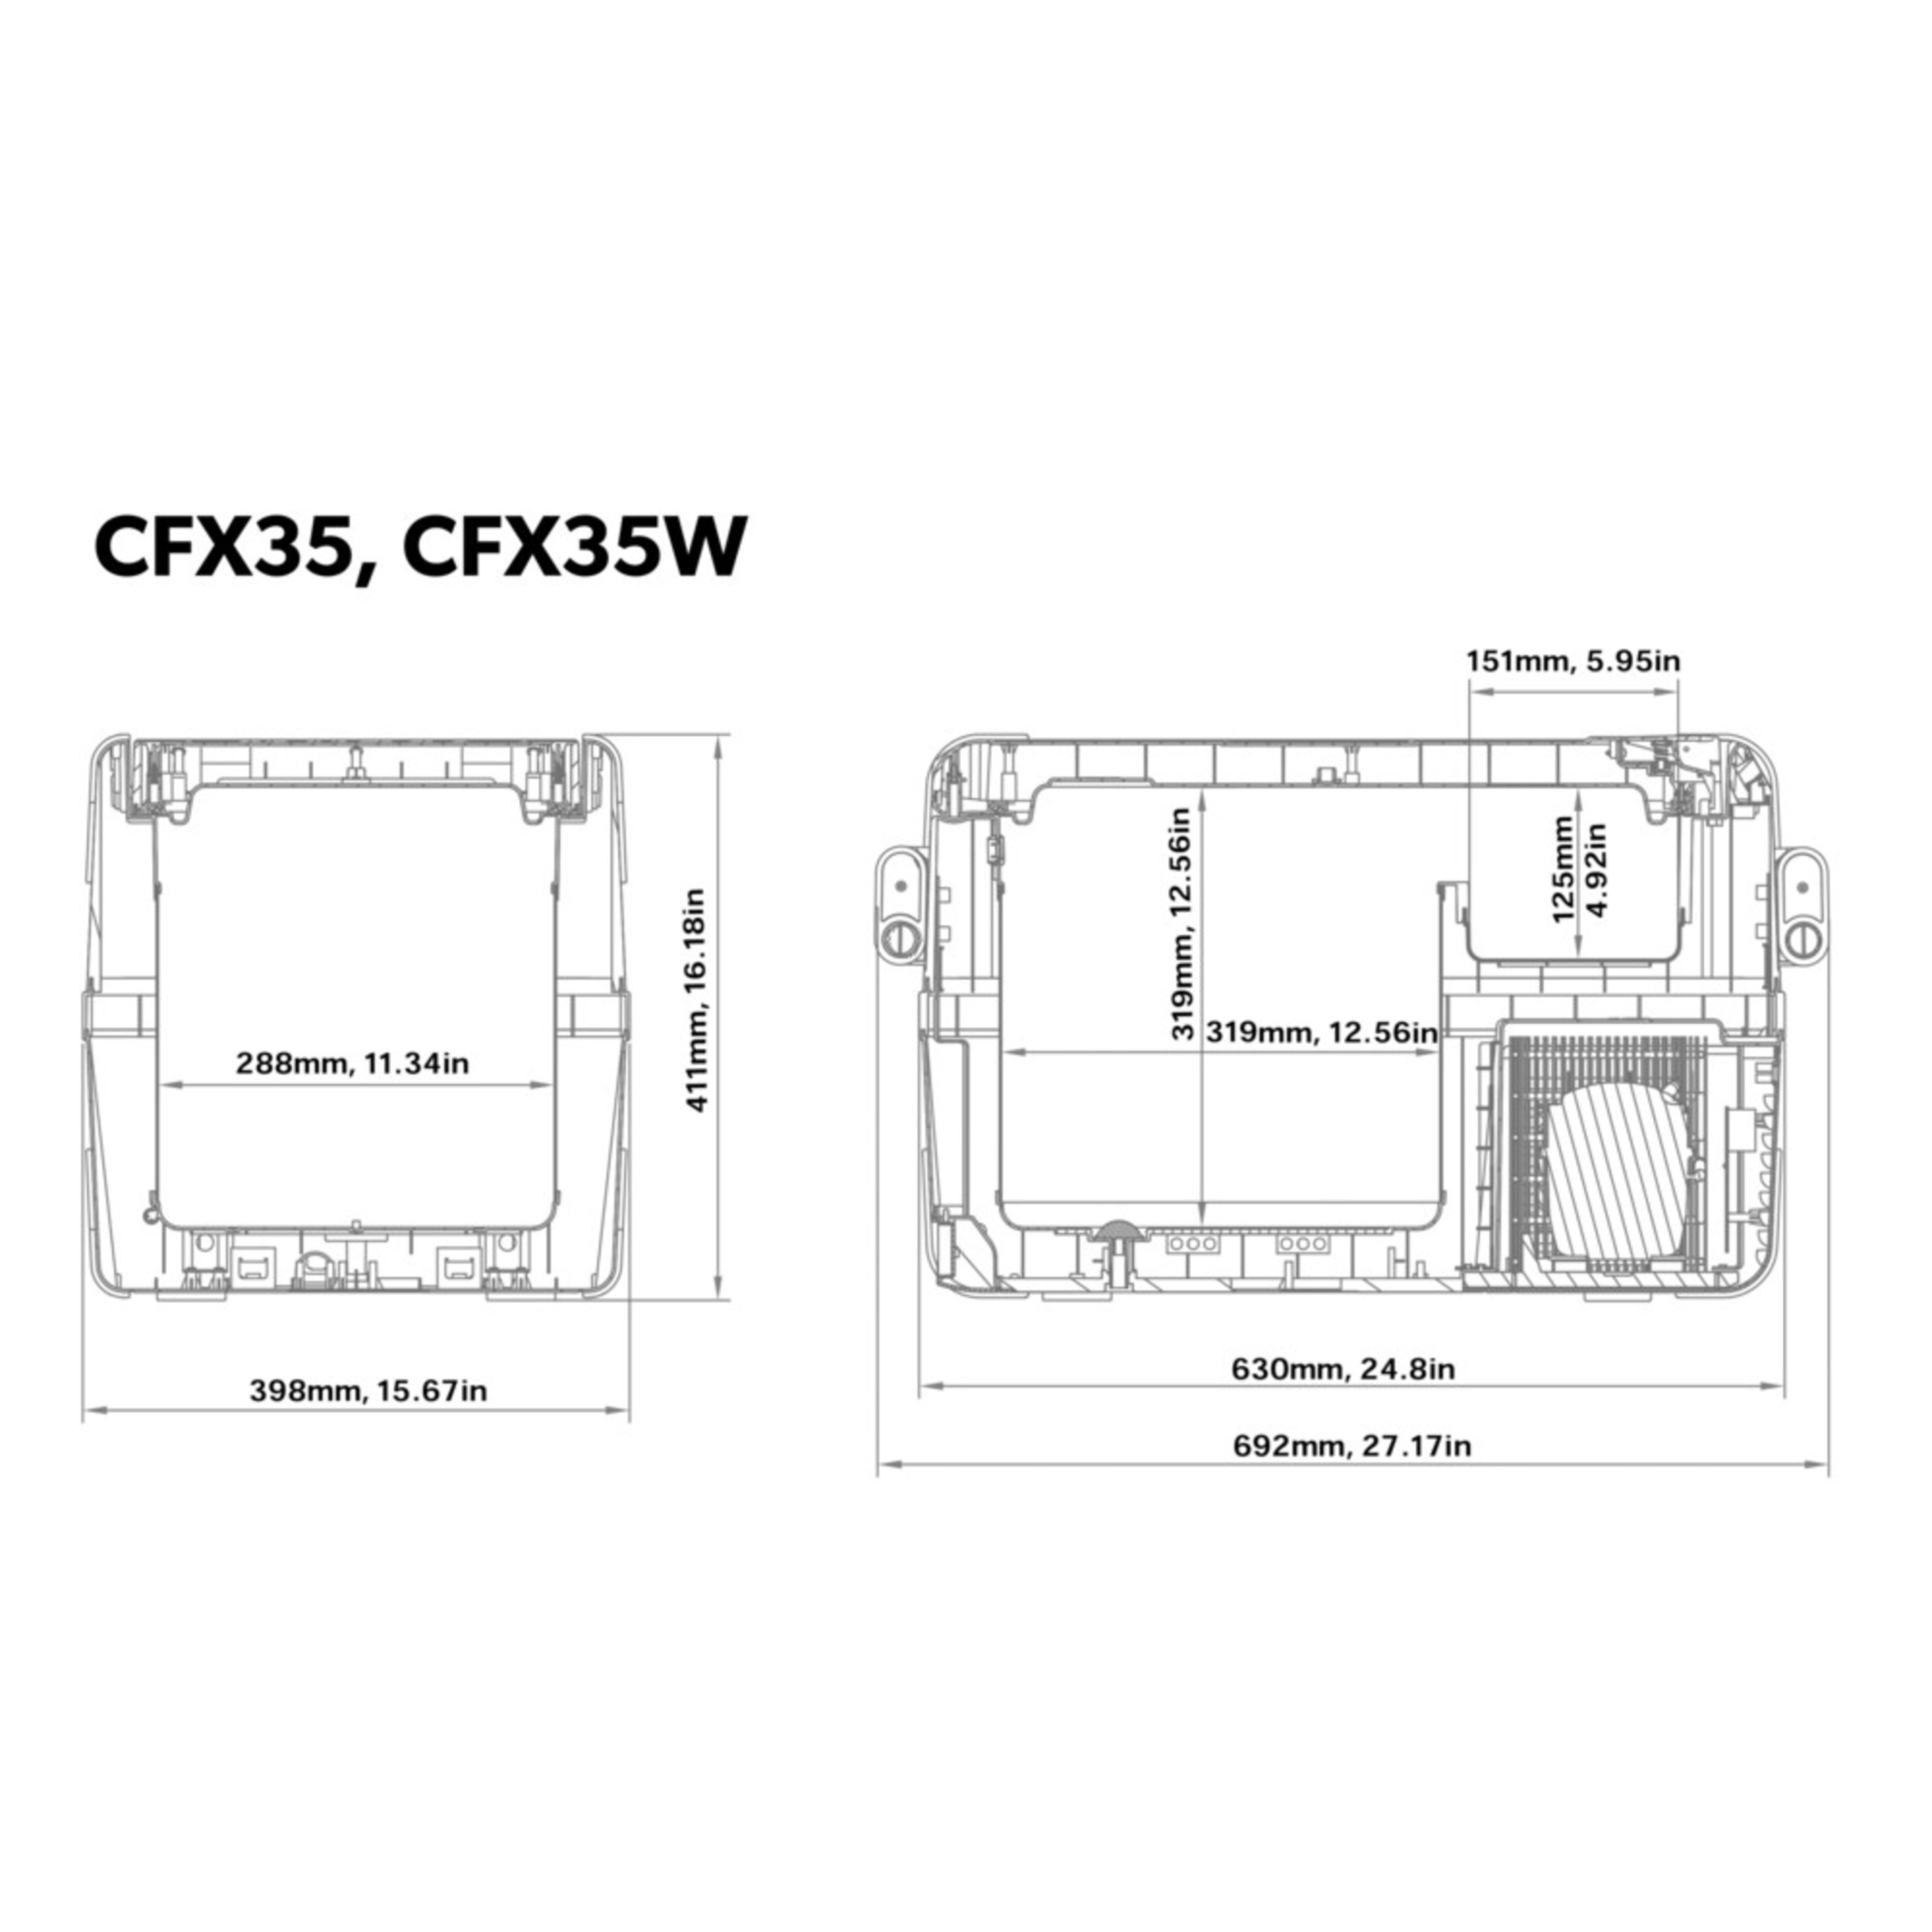 medium resolution of cfx 35w dimensions